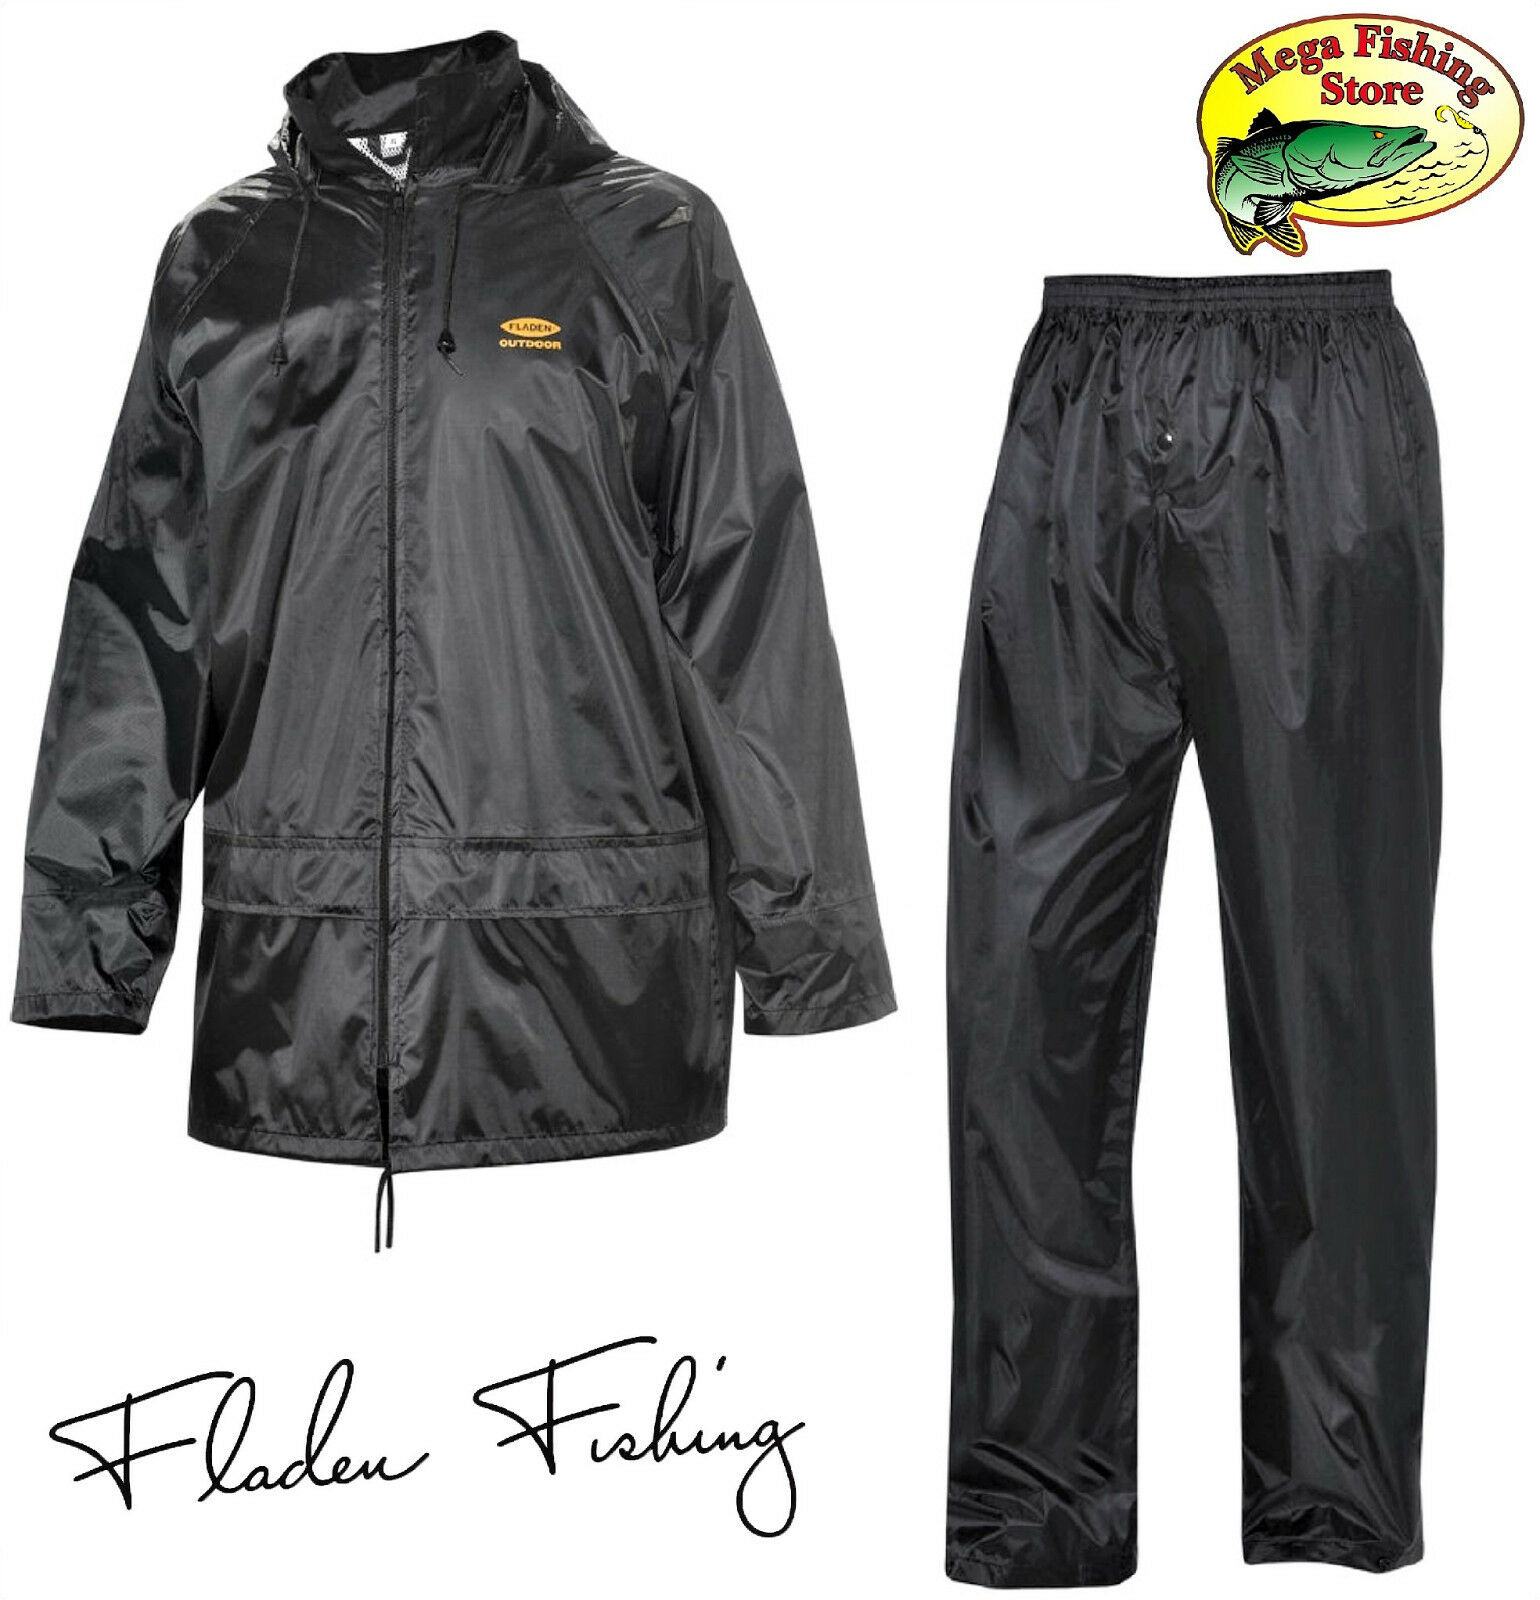 FLADEN Regenanzug Jacke + Hose - Angel Regen Anzug 2-Teiler - Outdoor & Angeln